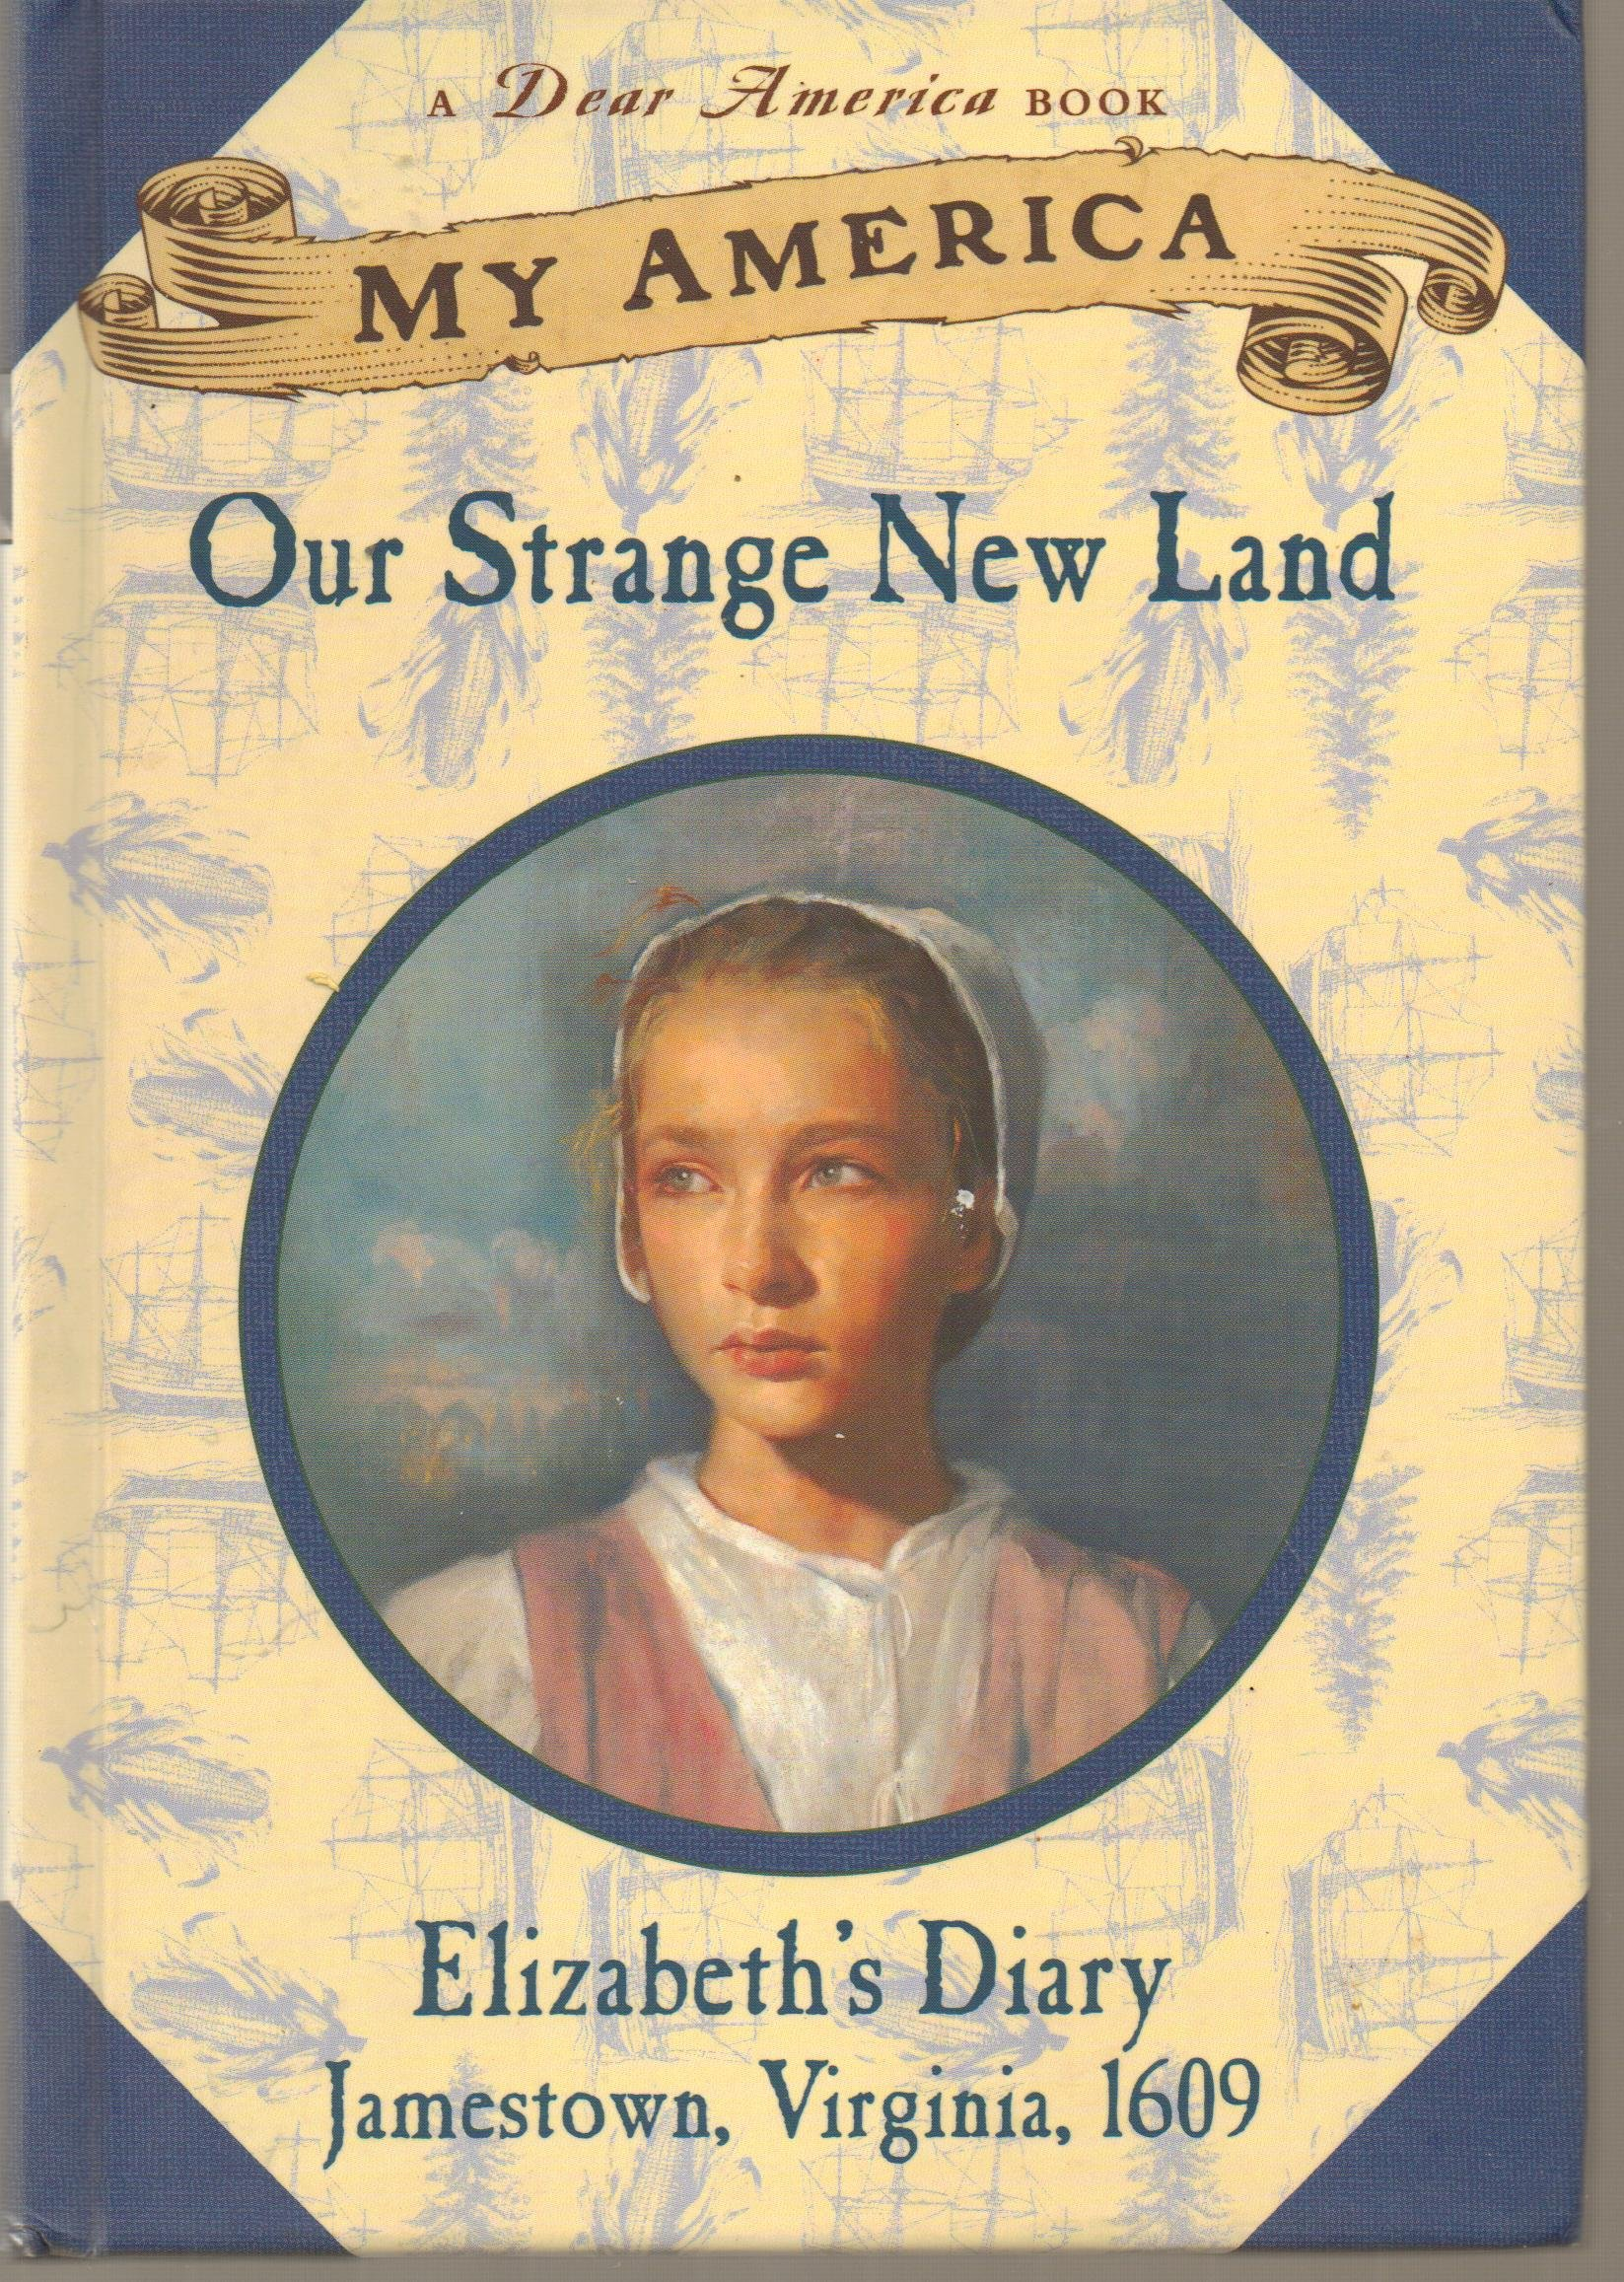 DEAR AMERICA - MY AMERICA - OUR STRANGE NEW LAND - ELIZABETH'S DIARY PDF